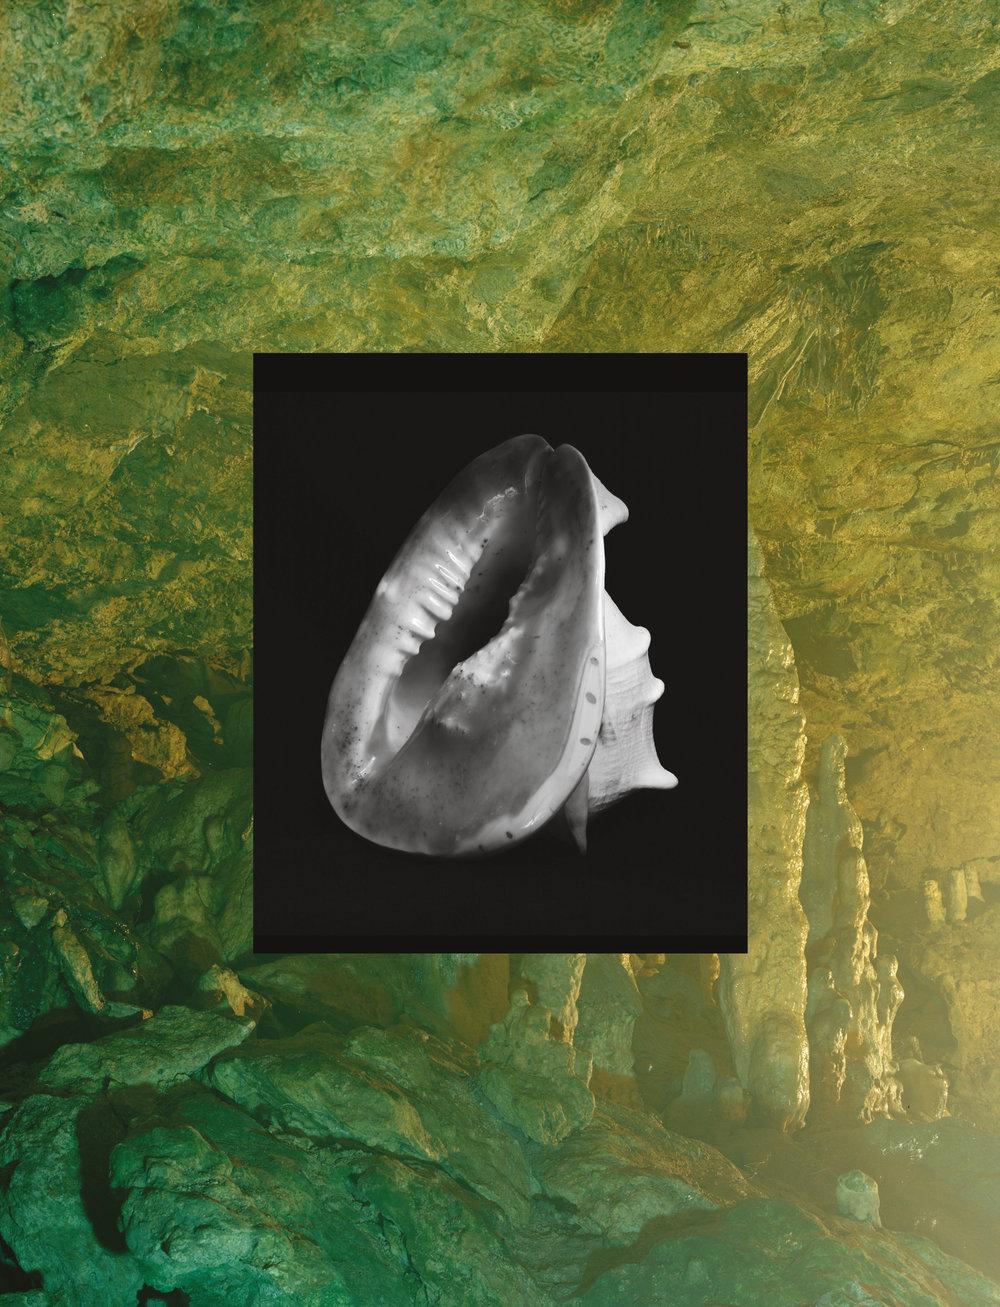 Esther-Teichmann-3.jpg